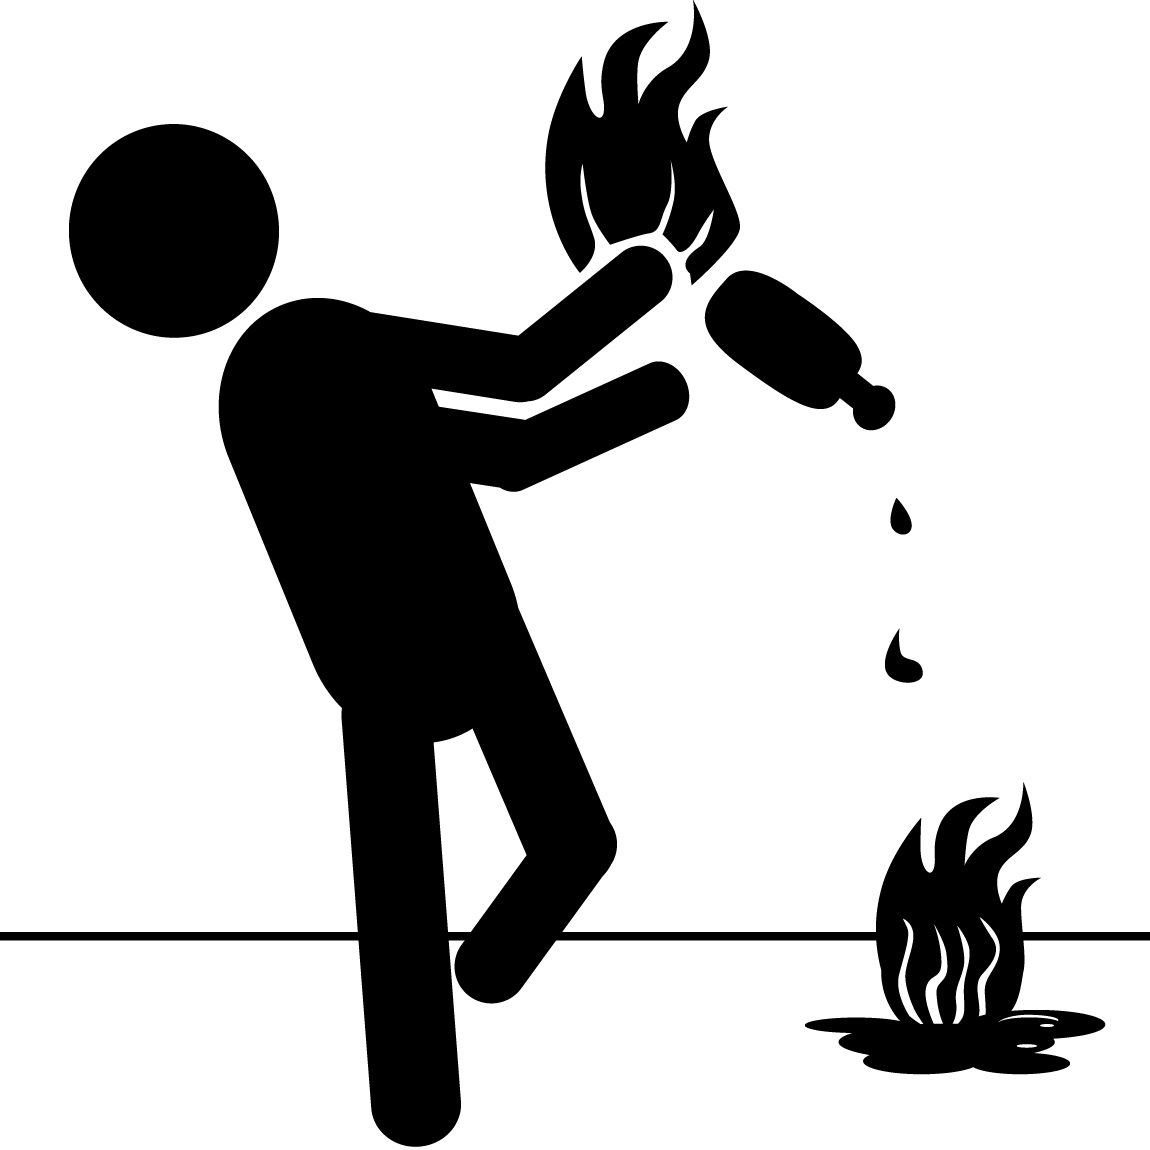 hazardous waste class 4: flammable solids